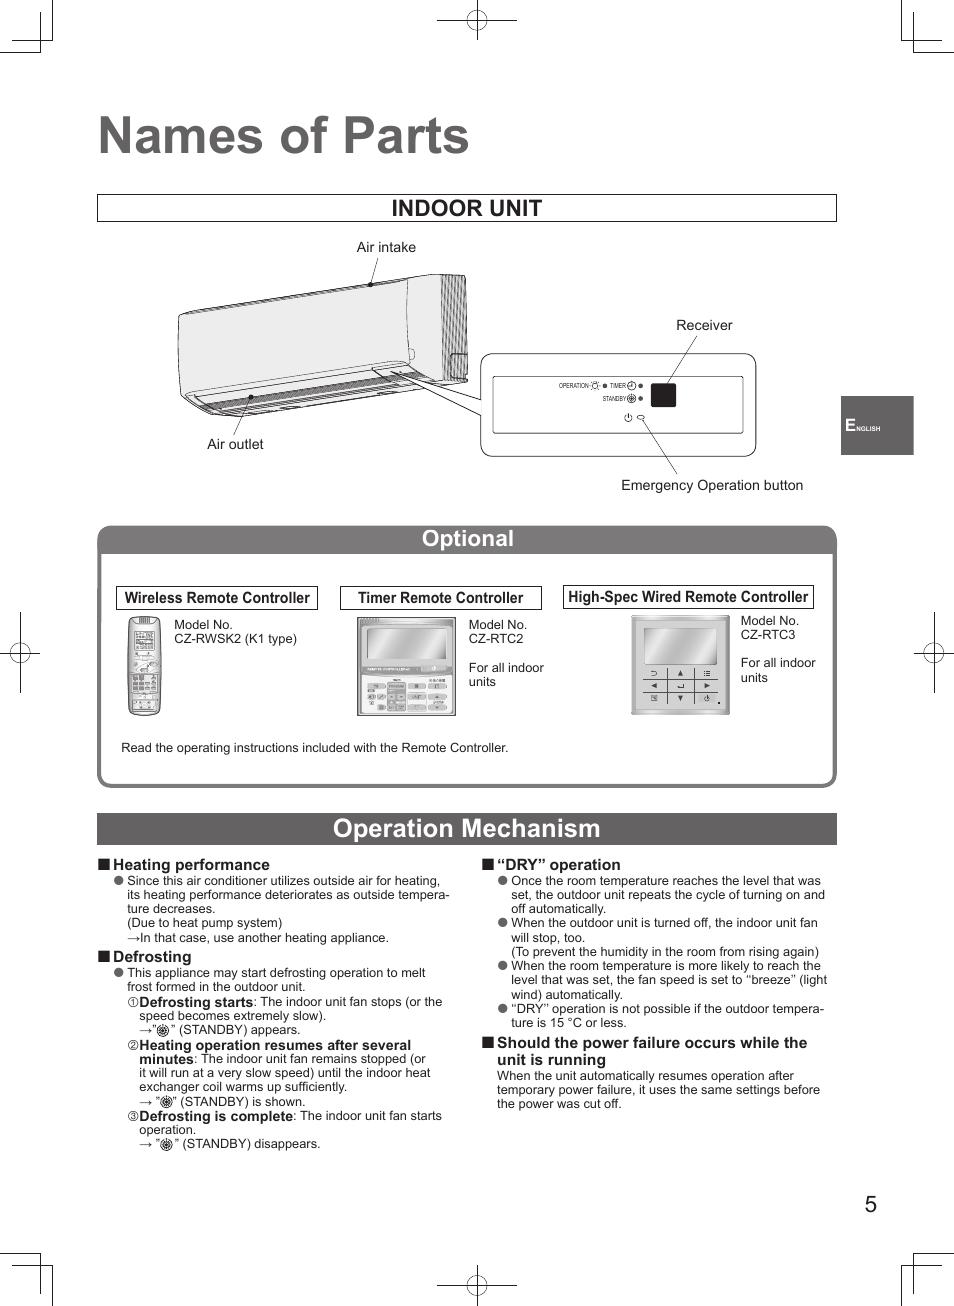 Names of parts, Operation mechanism, Indoor unit